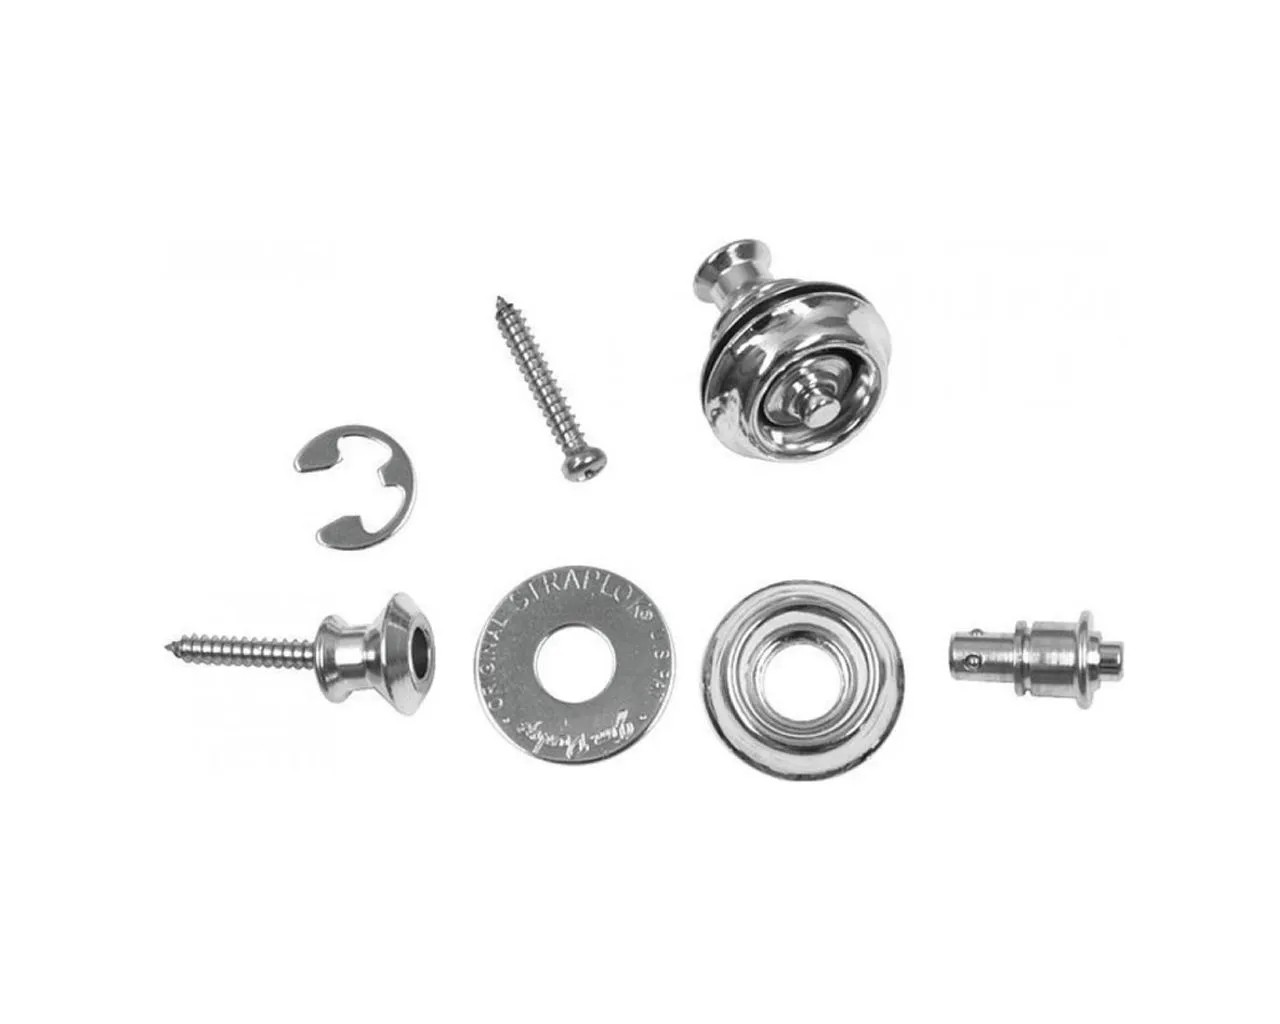 Roldana Strap Lock Original Nickel Kit Sls1101n Dunlop